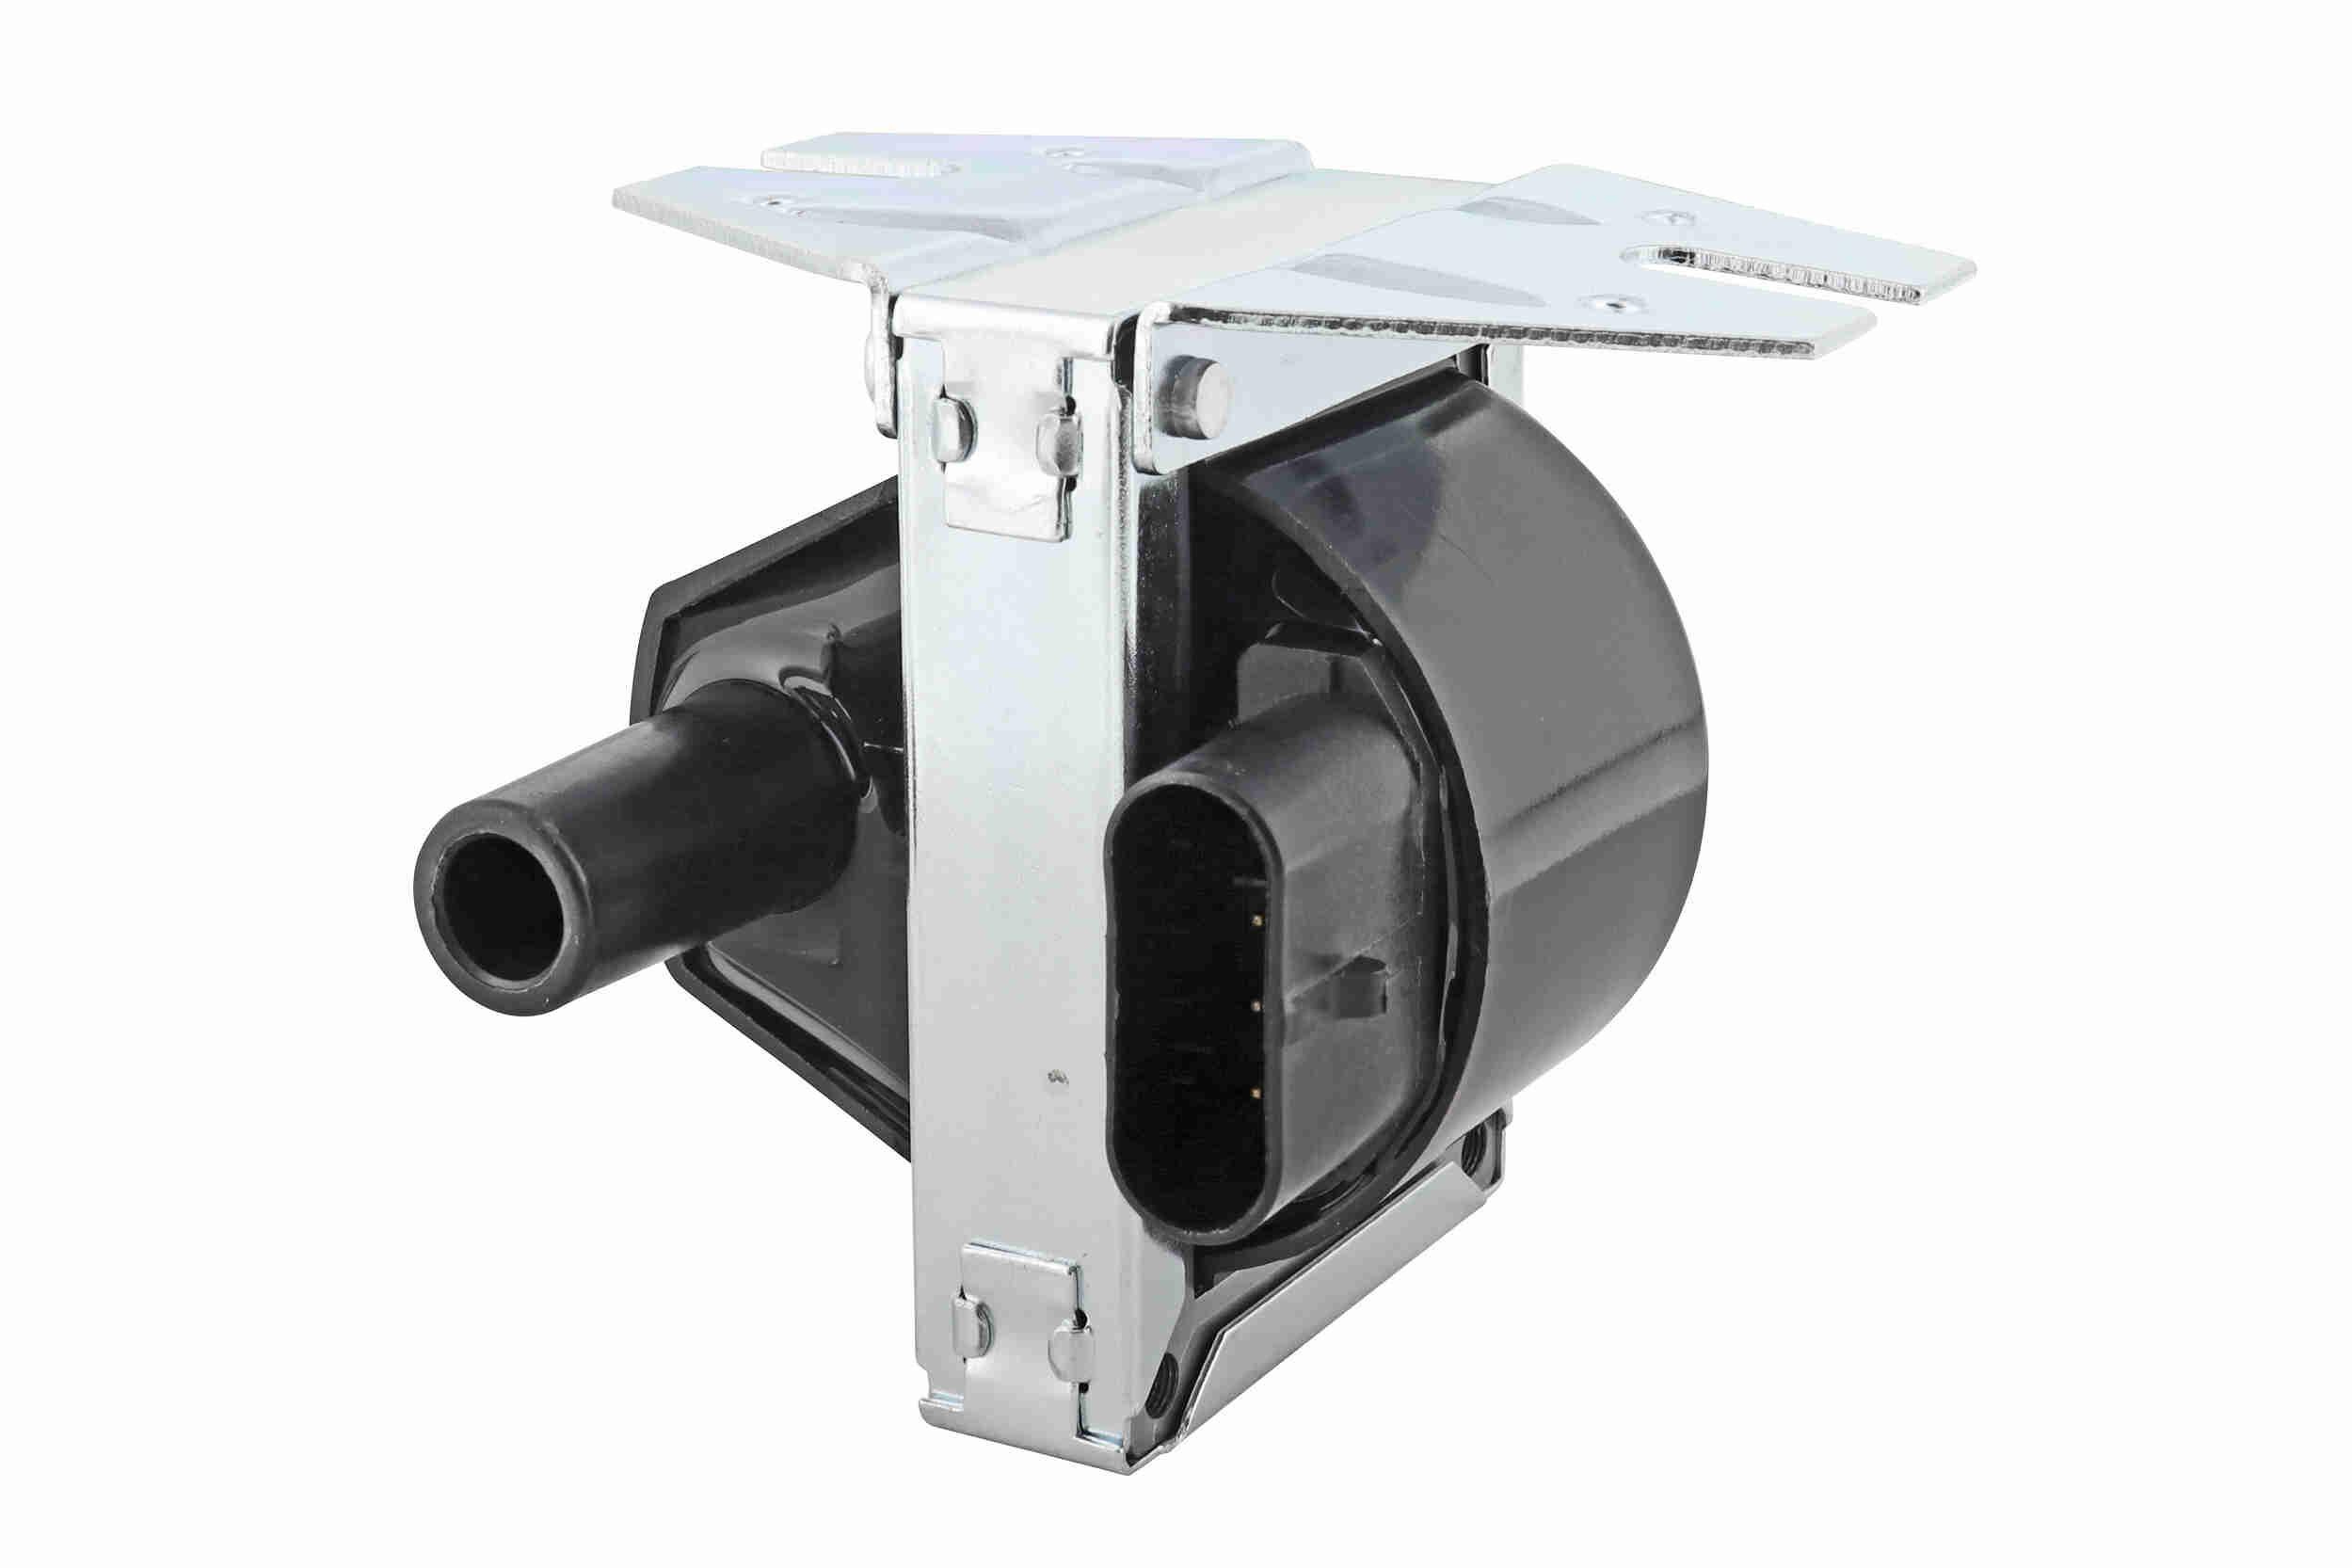 Zündspule V24-70-0012 VEMO V24-70-0012 in Original Qualität